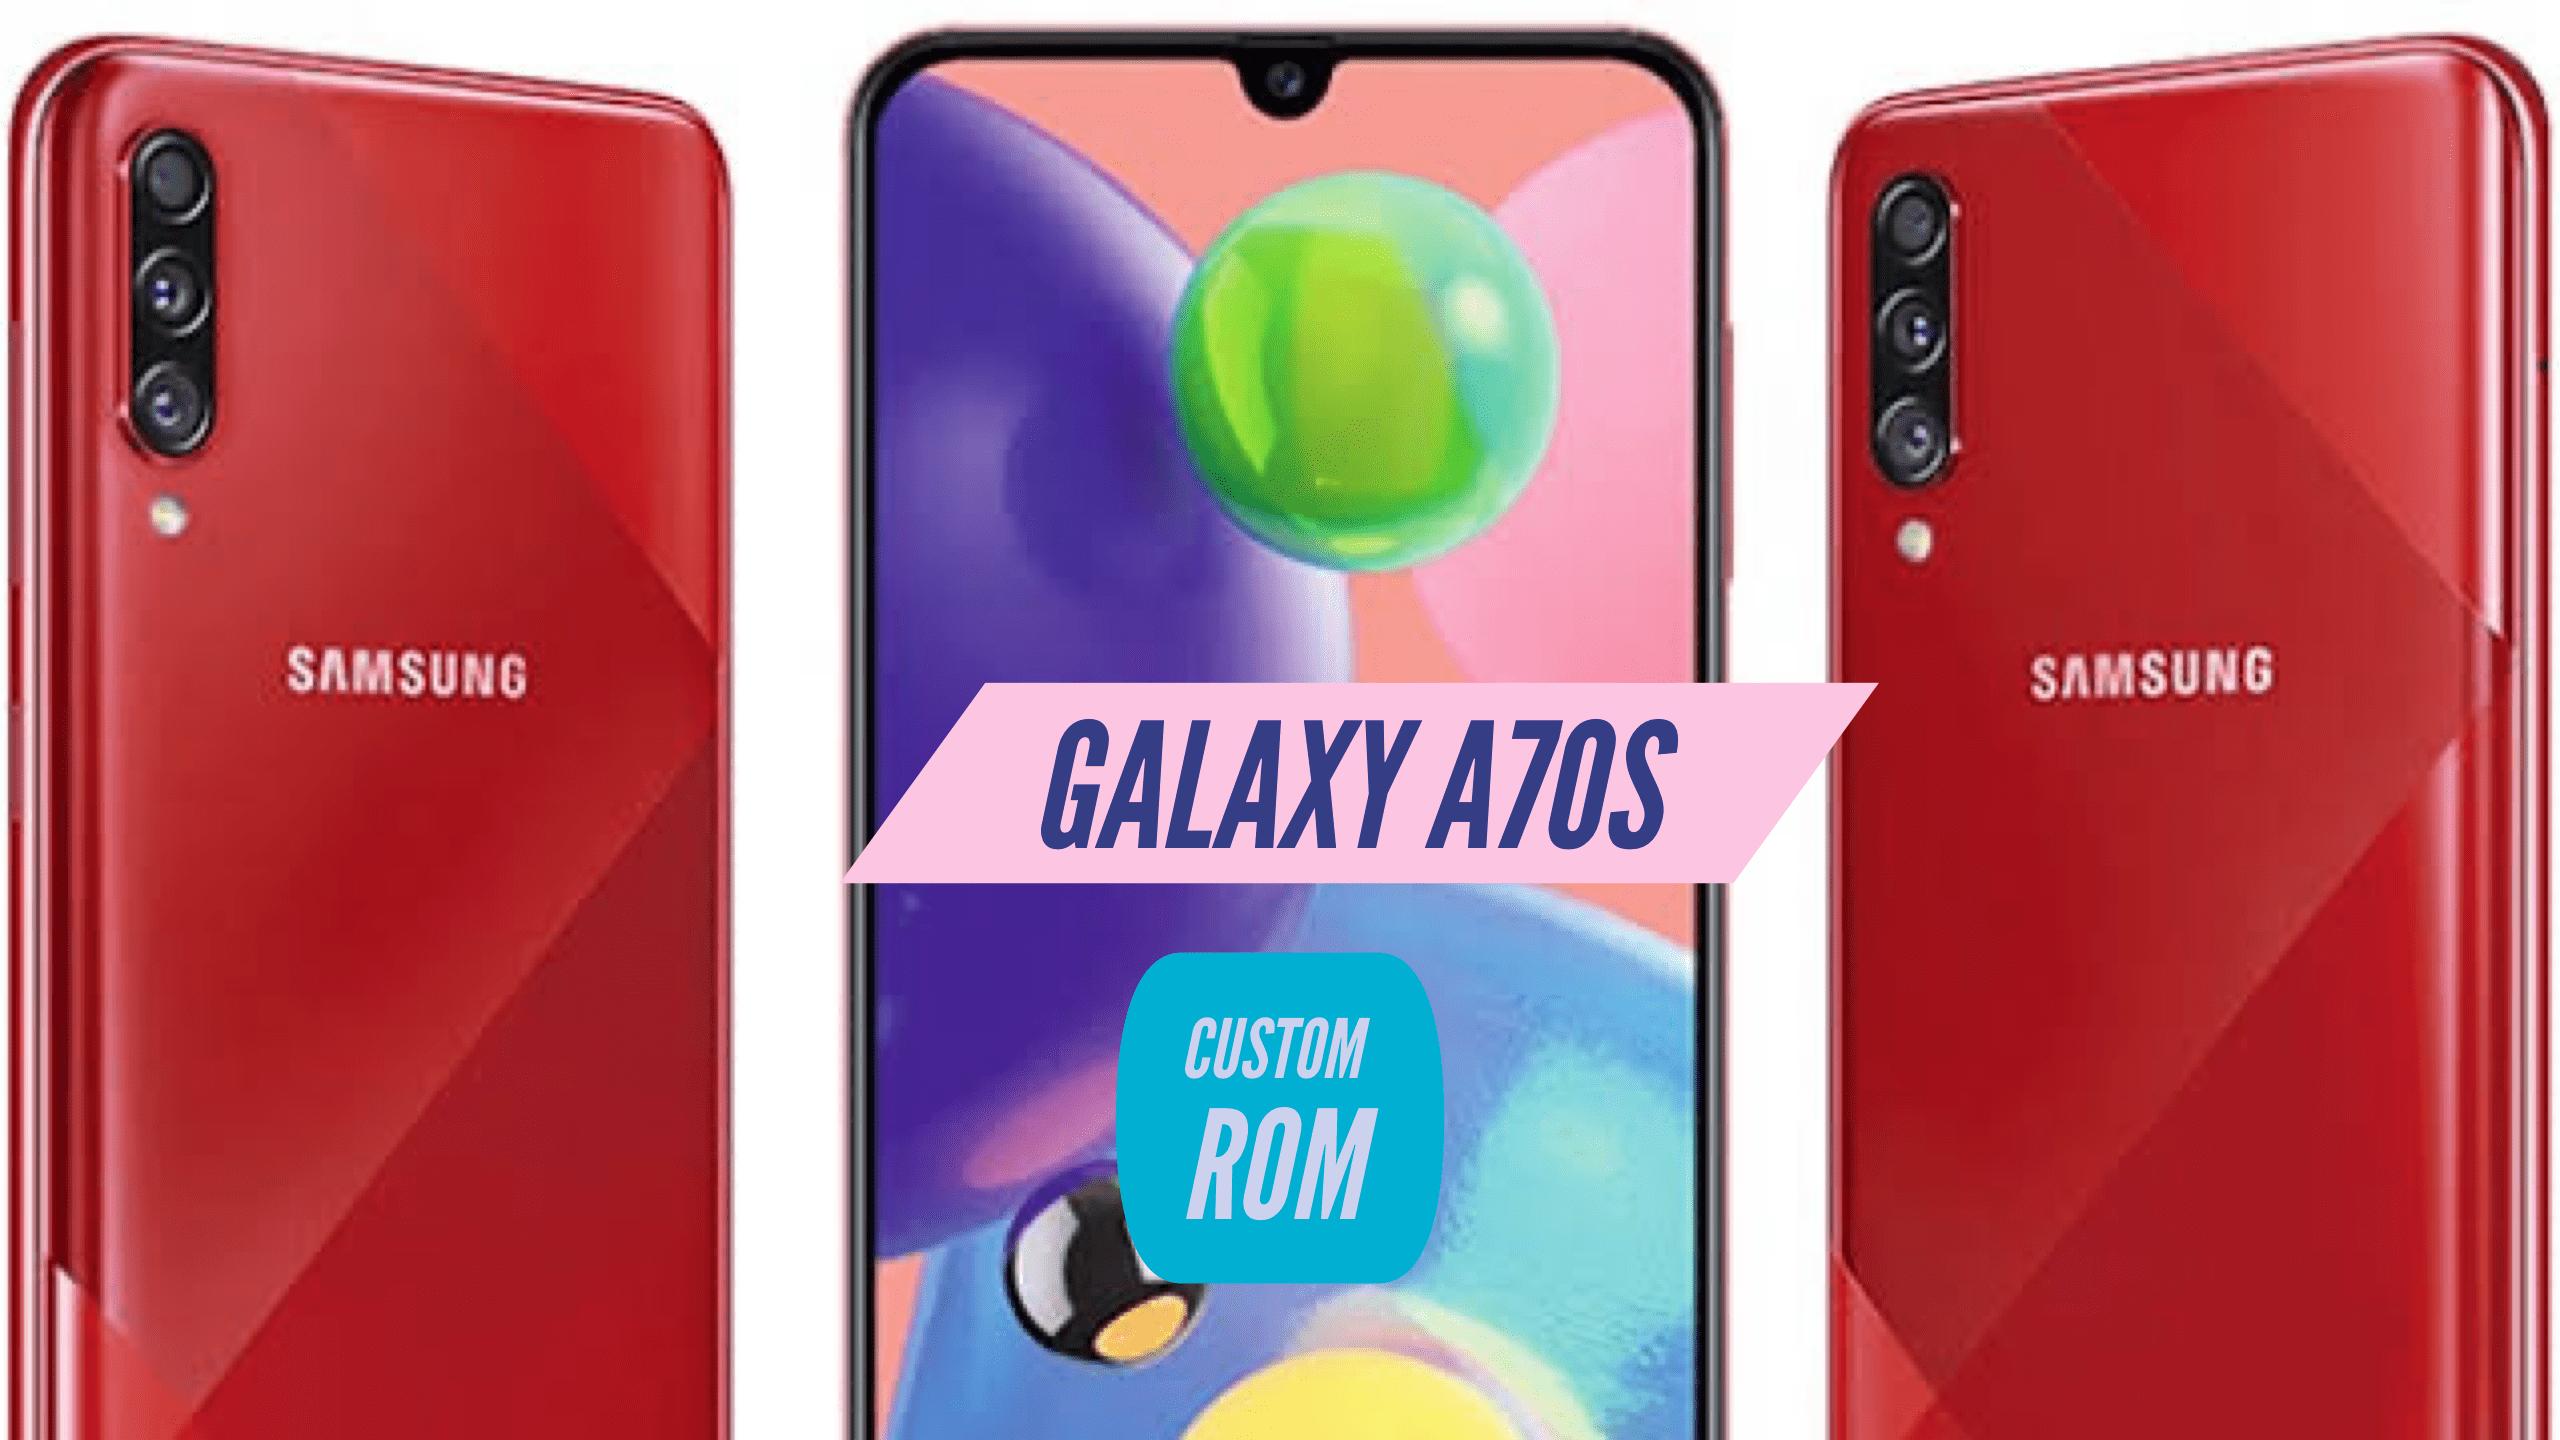 Galaxy A70s Custom ROM